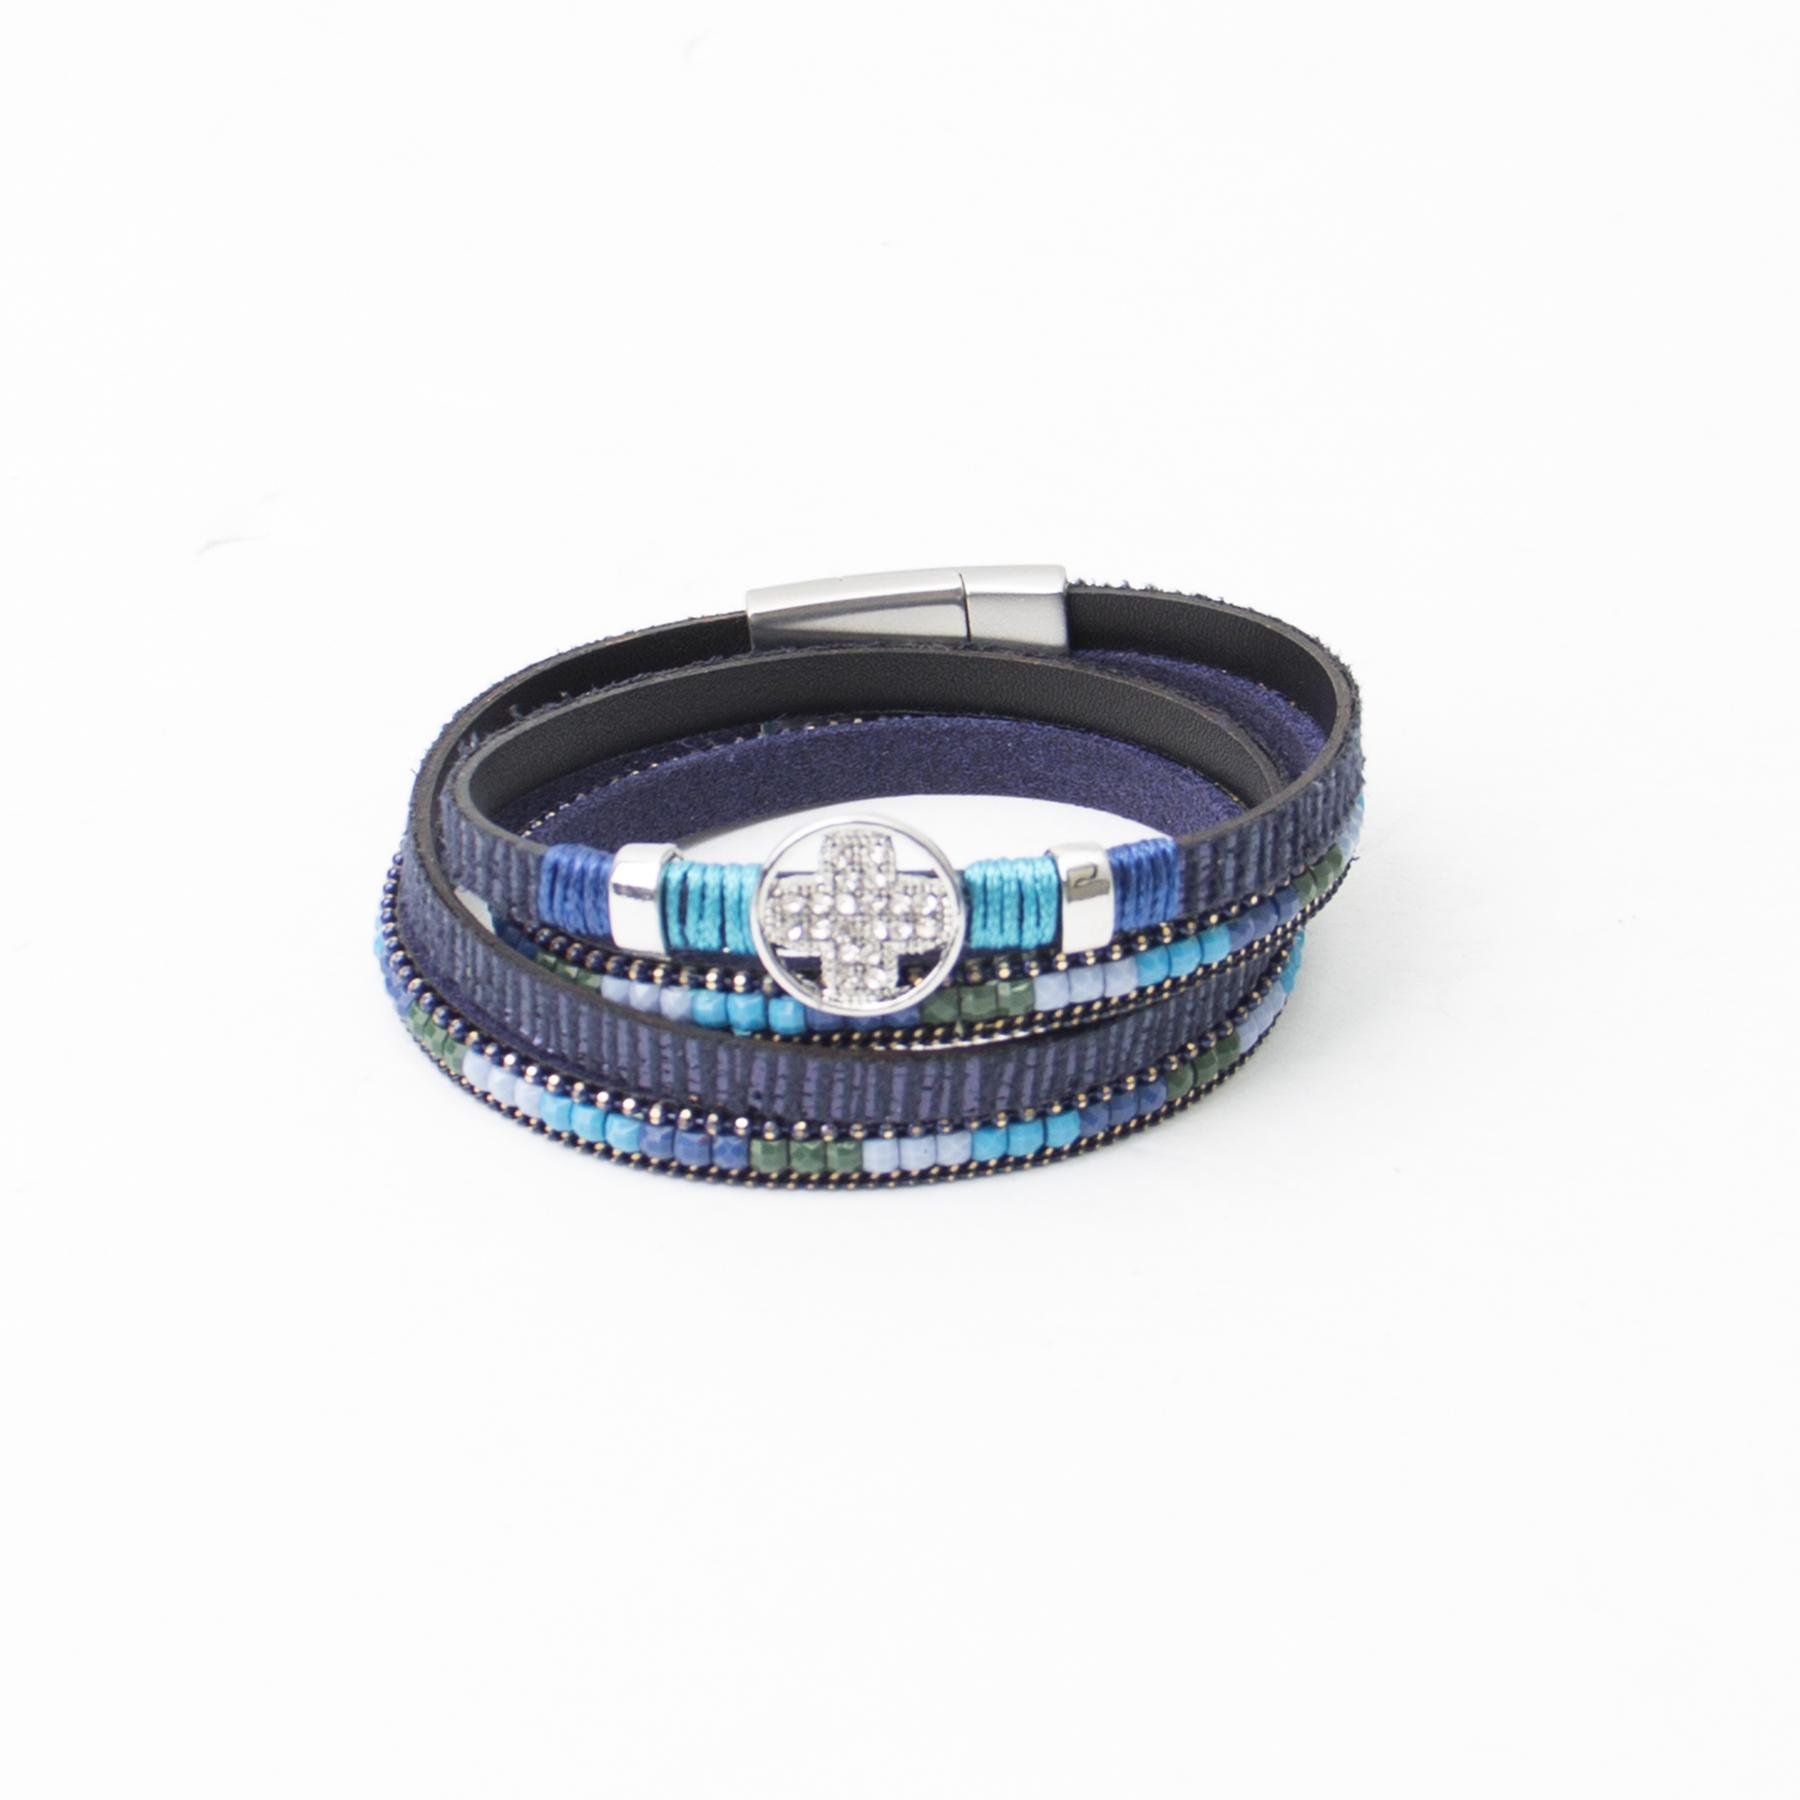 NB16-03 BLUE